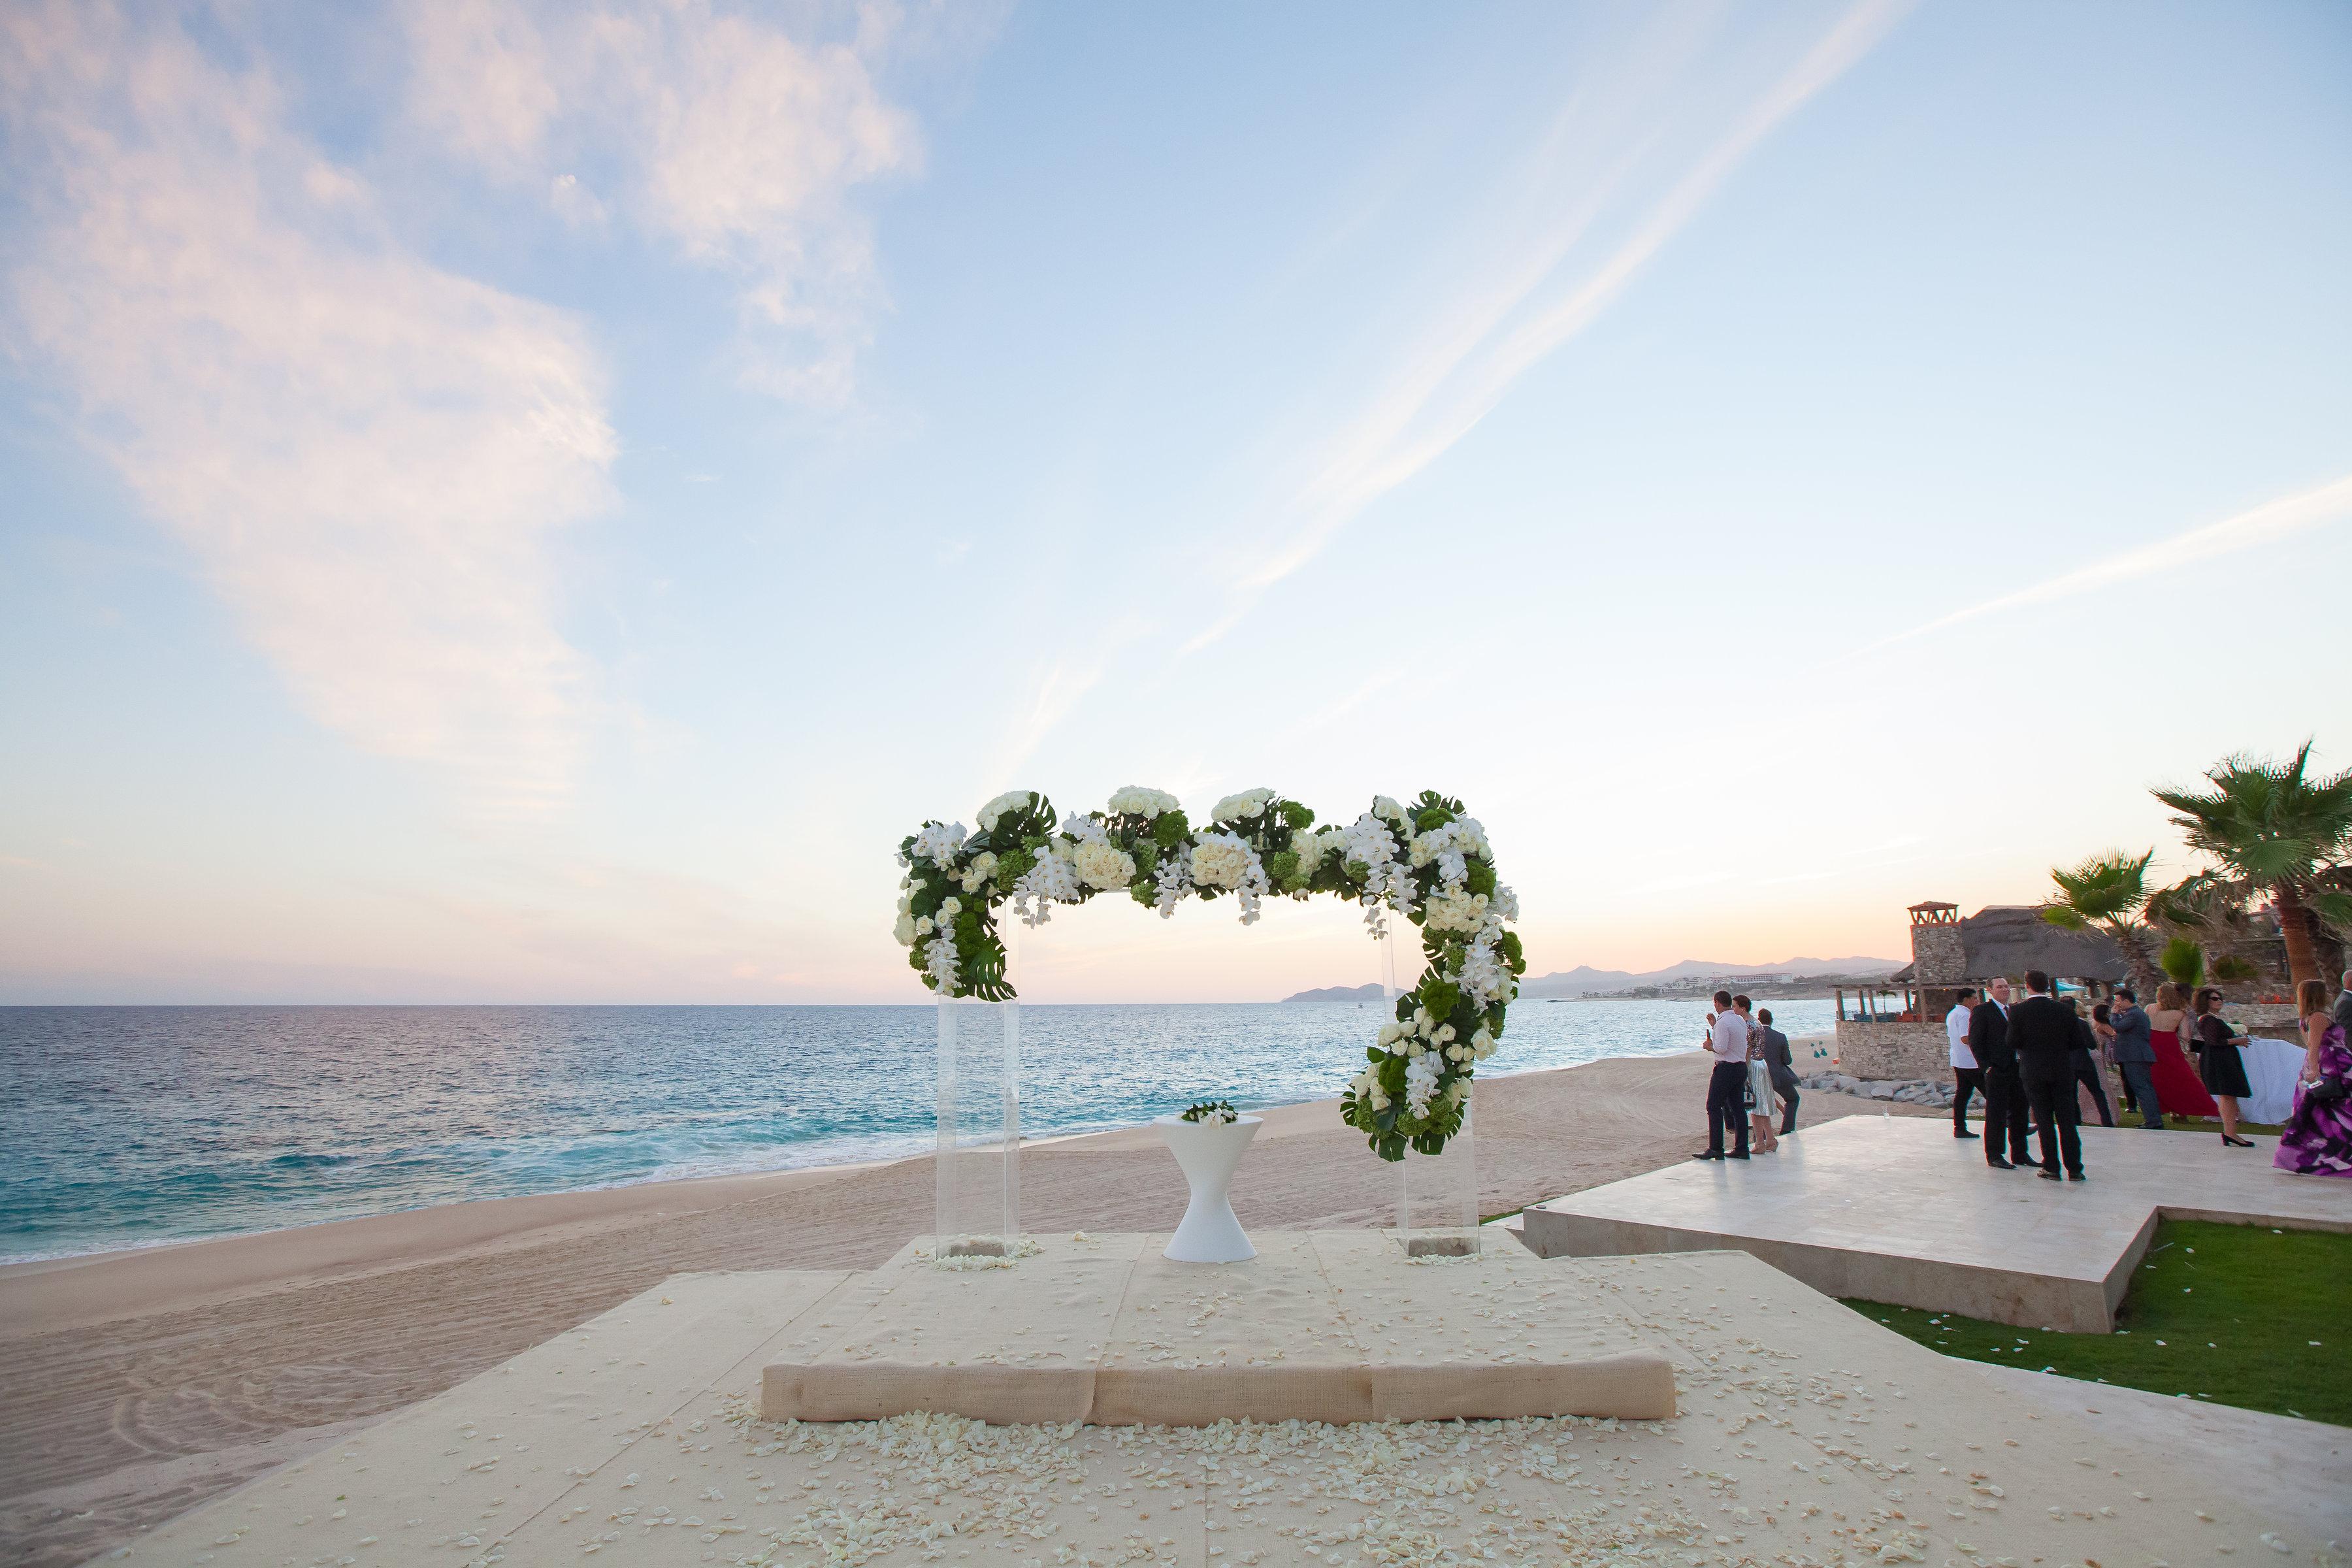 Stunning Destination Wedding - Mindy Weiss Party Consultants